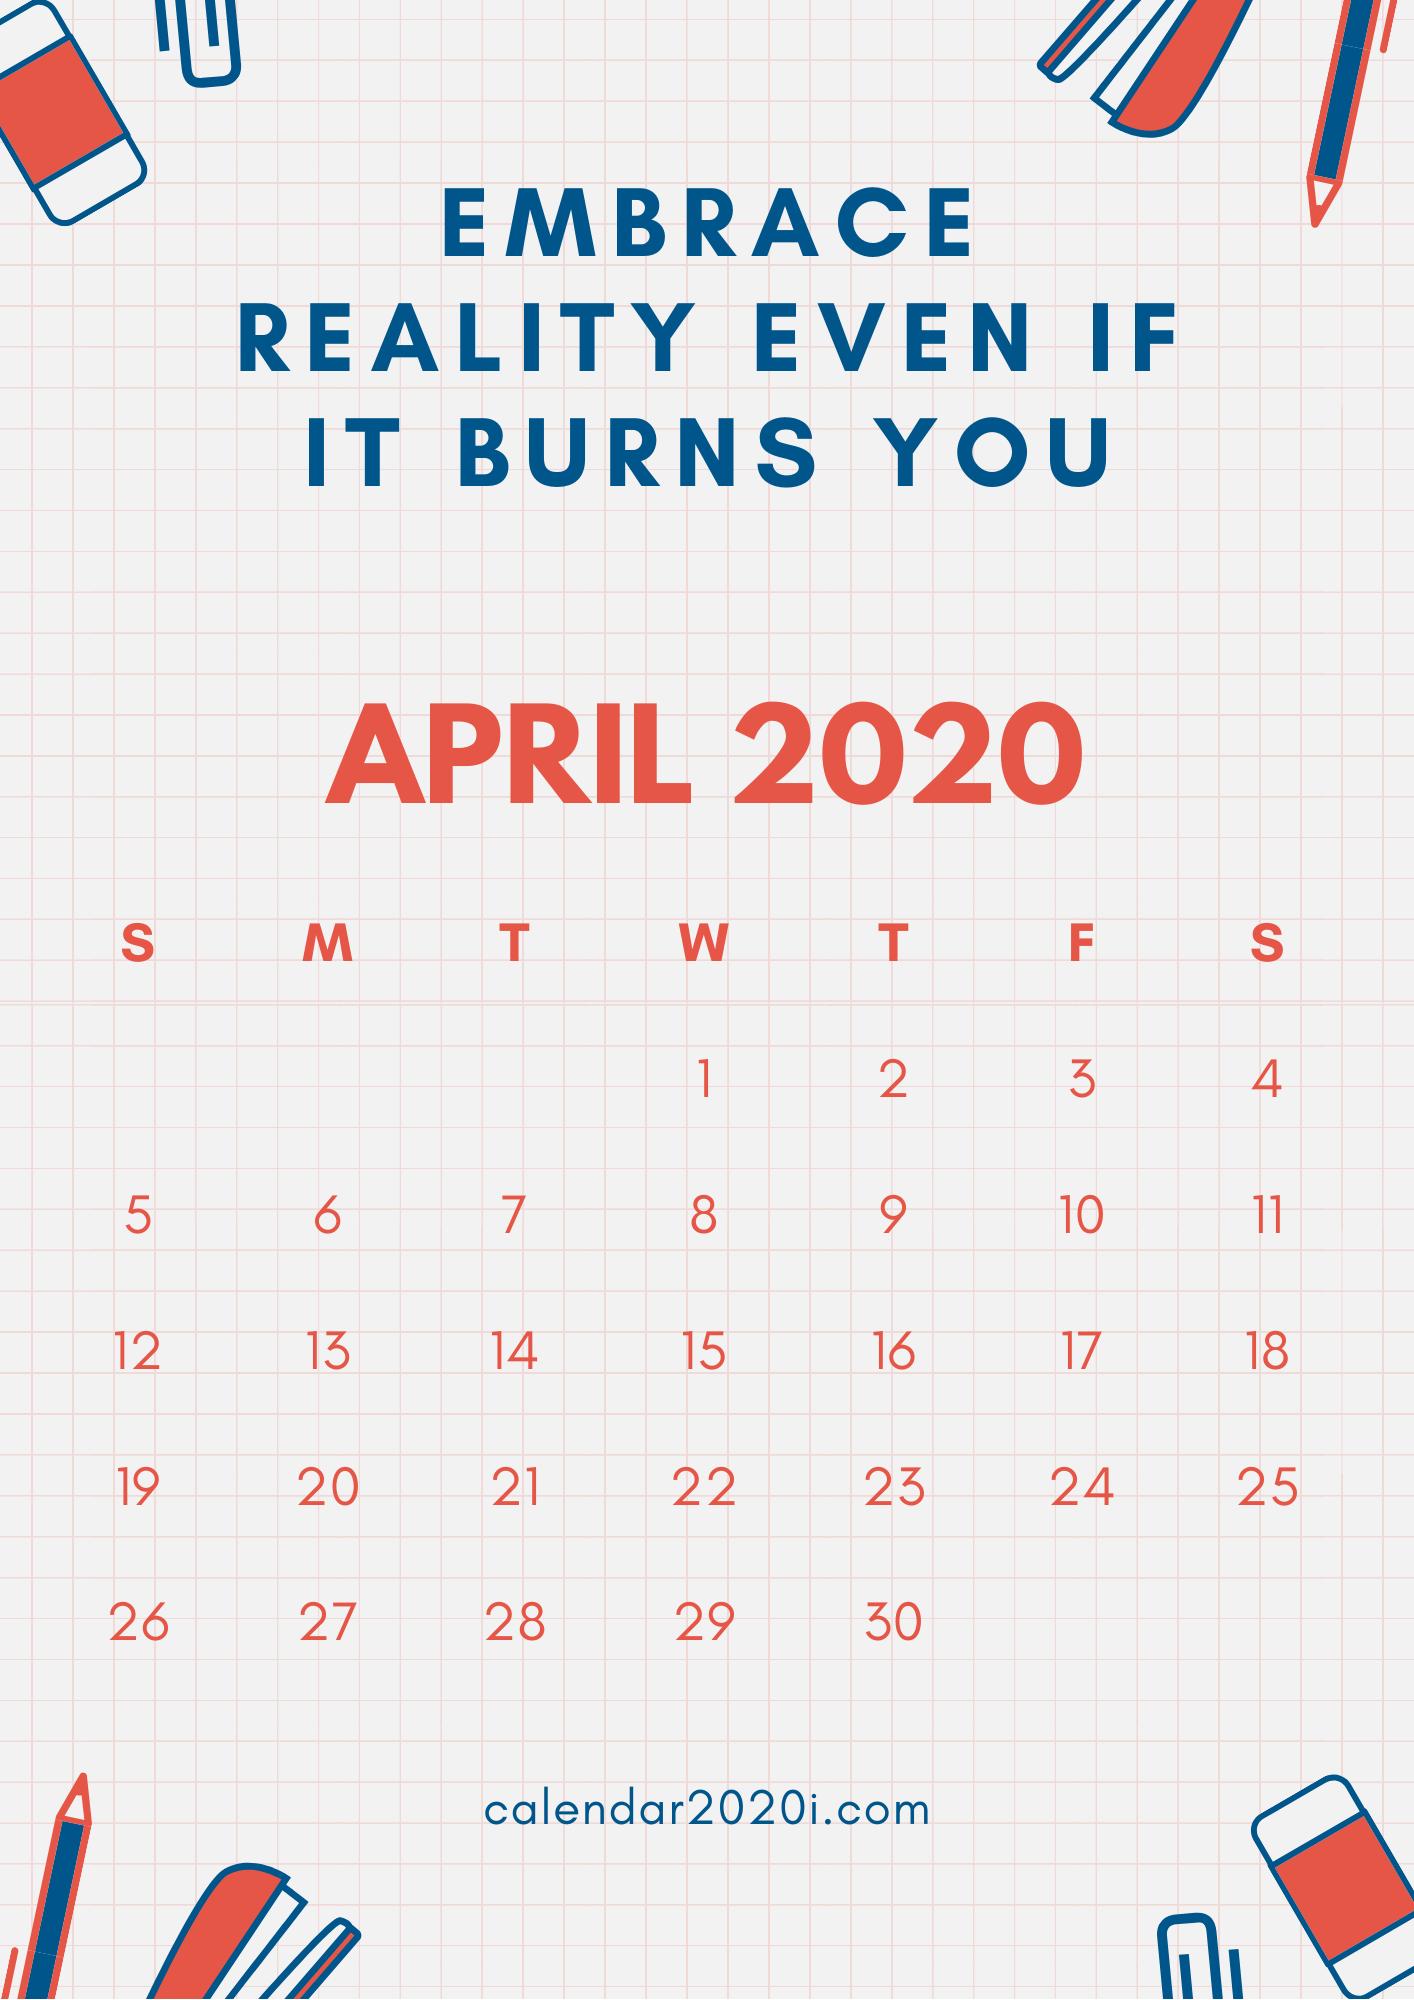 Inspiring April 2020 Calendar With Quotes | Calendar 2020 in April Calendar Quotes And Sayings